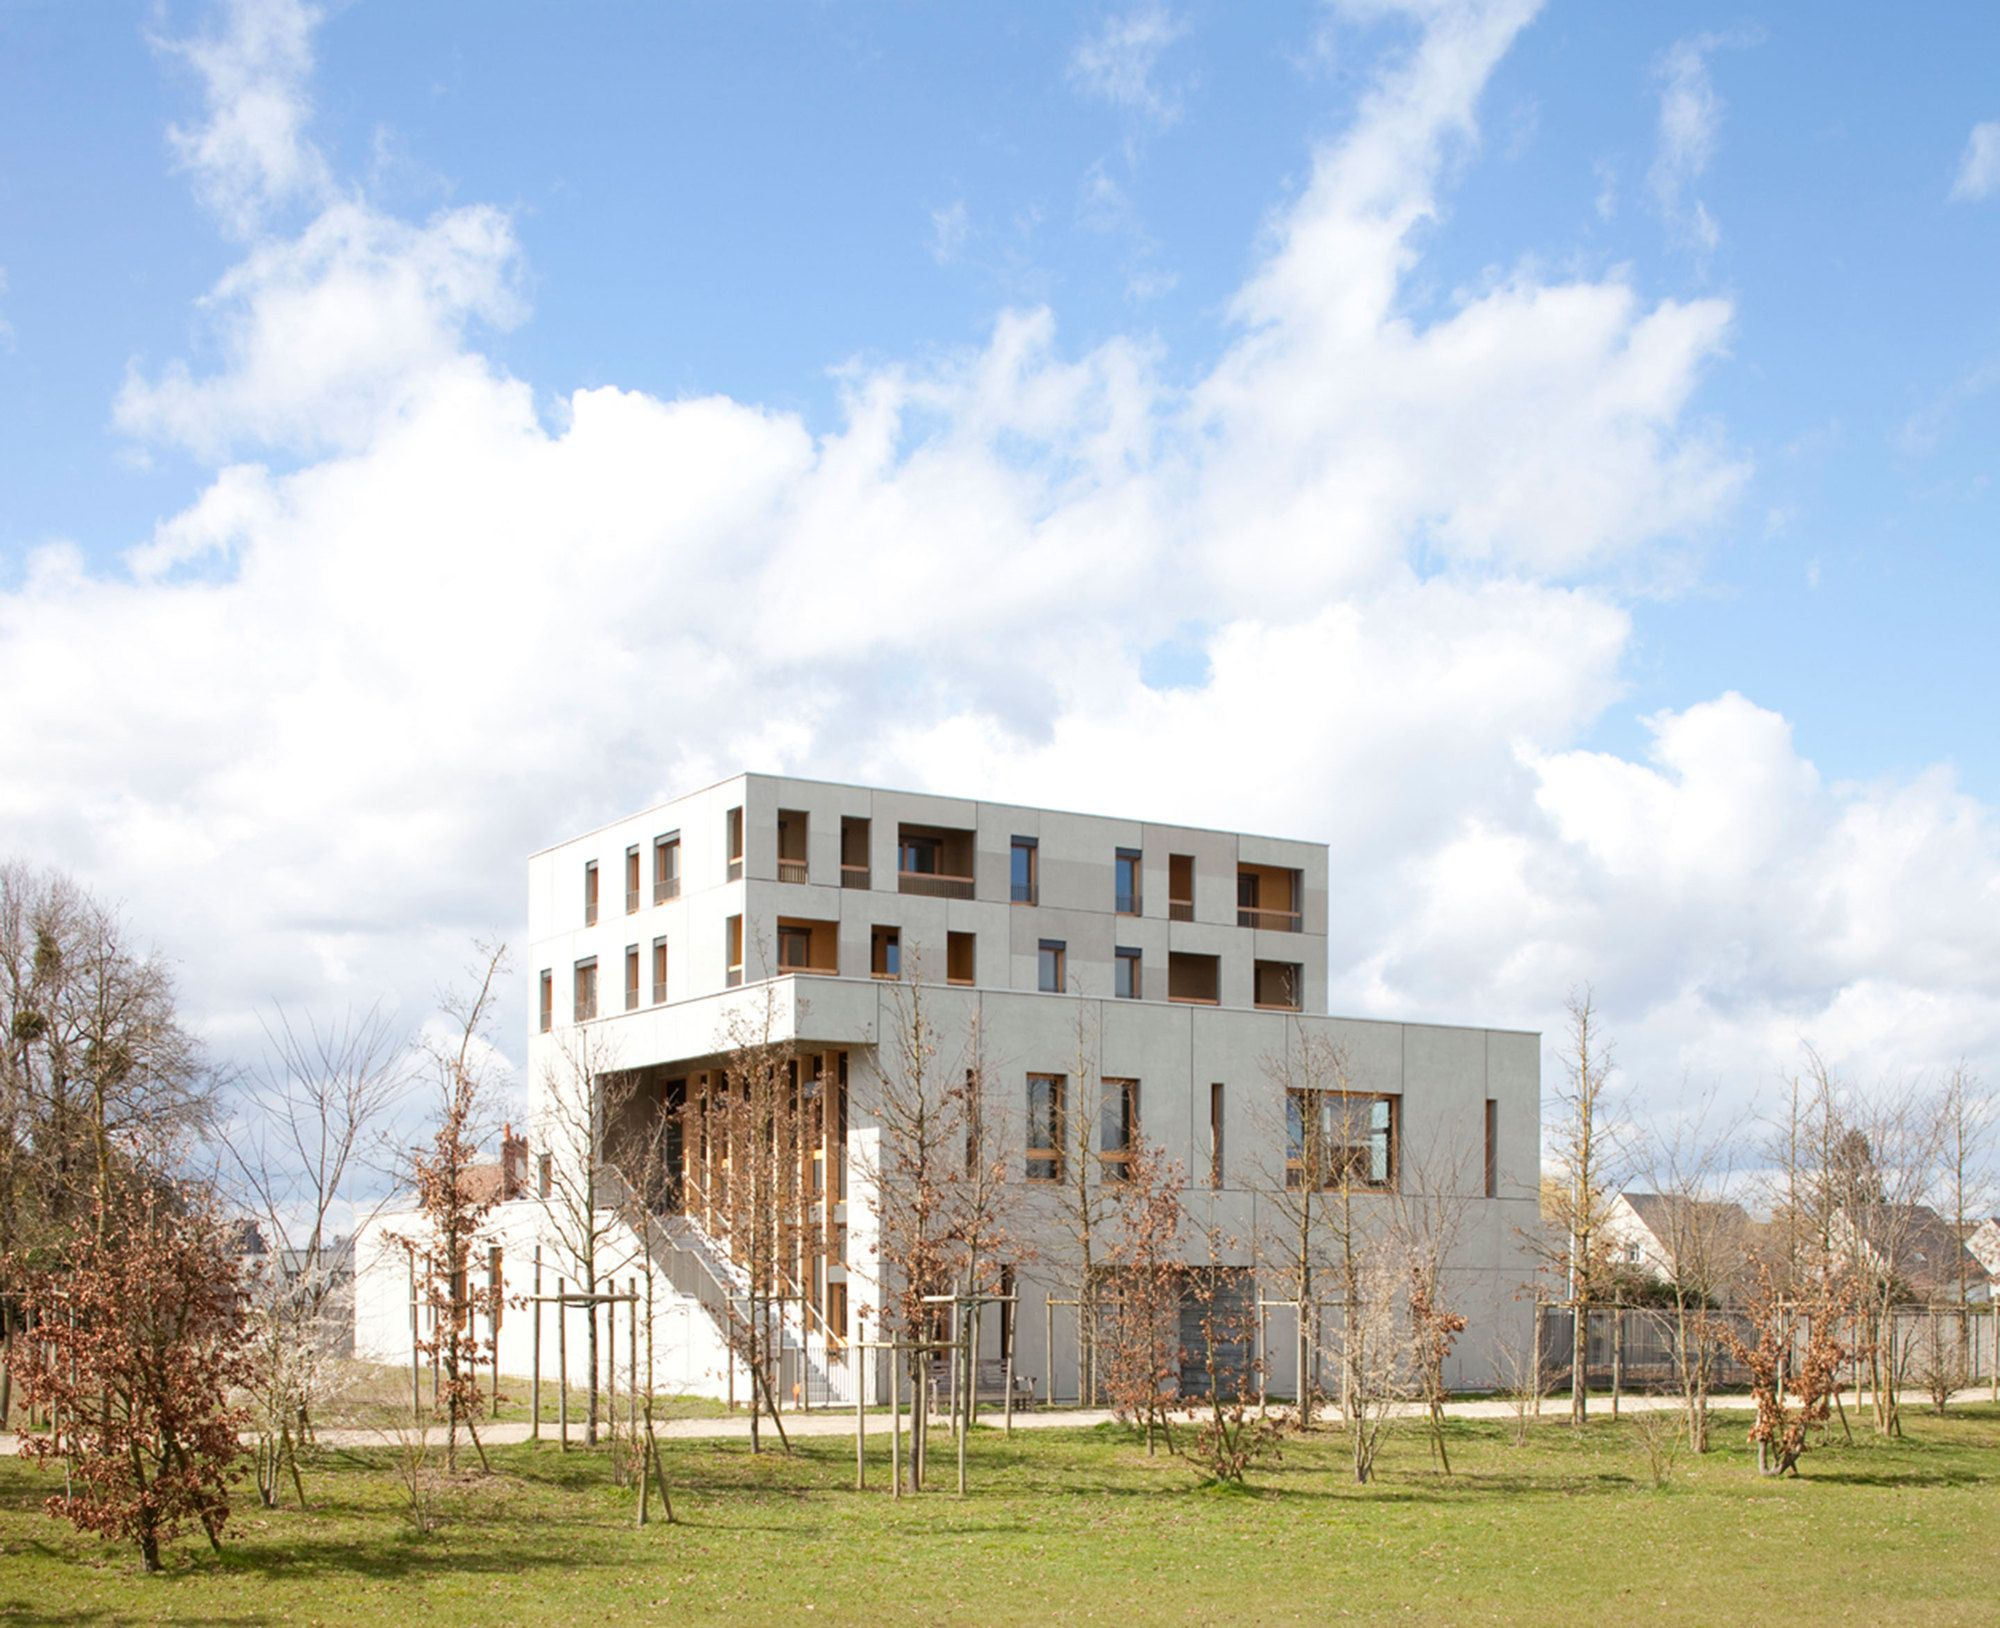 stucco  536426f8c07a805651000047_la-grenouill-re-eva-samuel-architecte-associ-s_00portada.jpg (2000×1628)